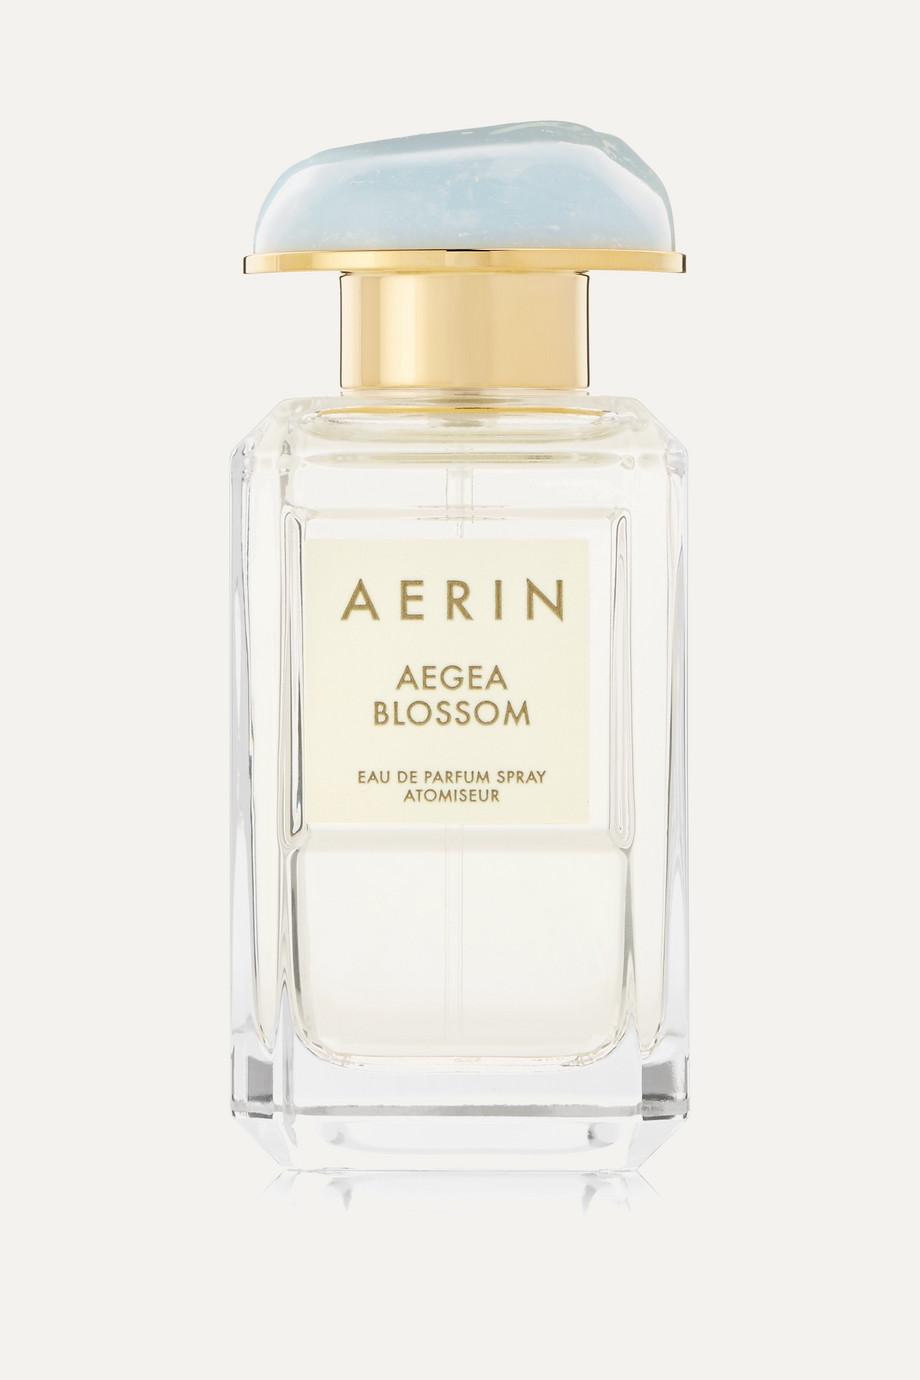 AERIN Beauty Aegea Blossom, 50 ml – Eau de Parfum